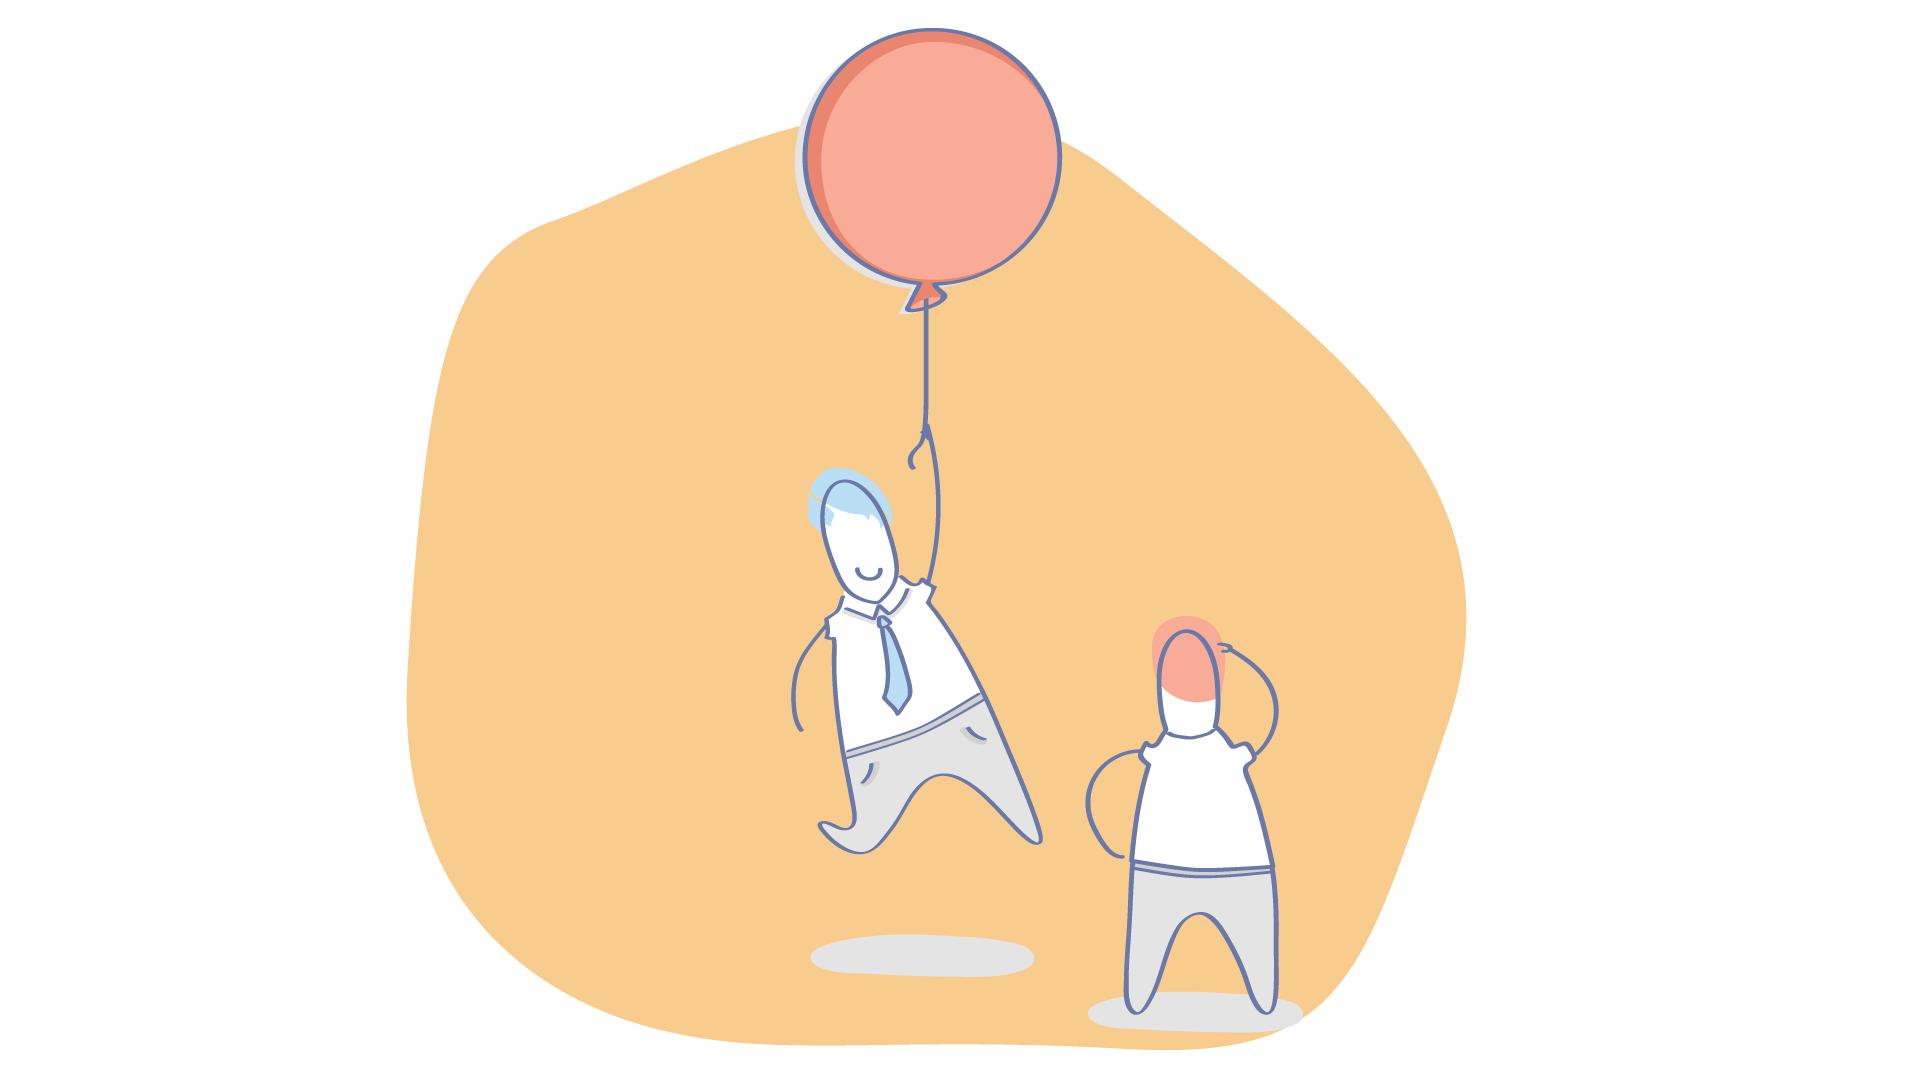 7 ideas para quitar clientes a la competencia